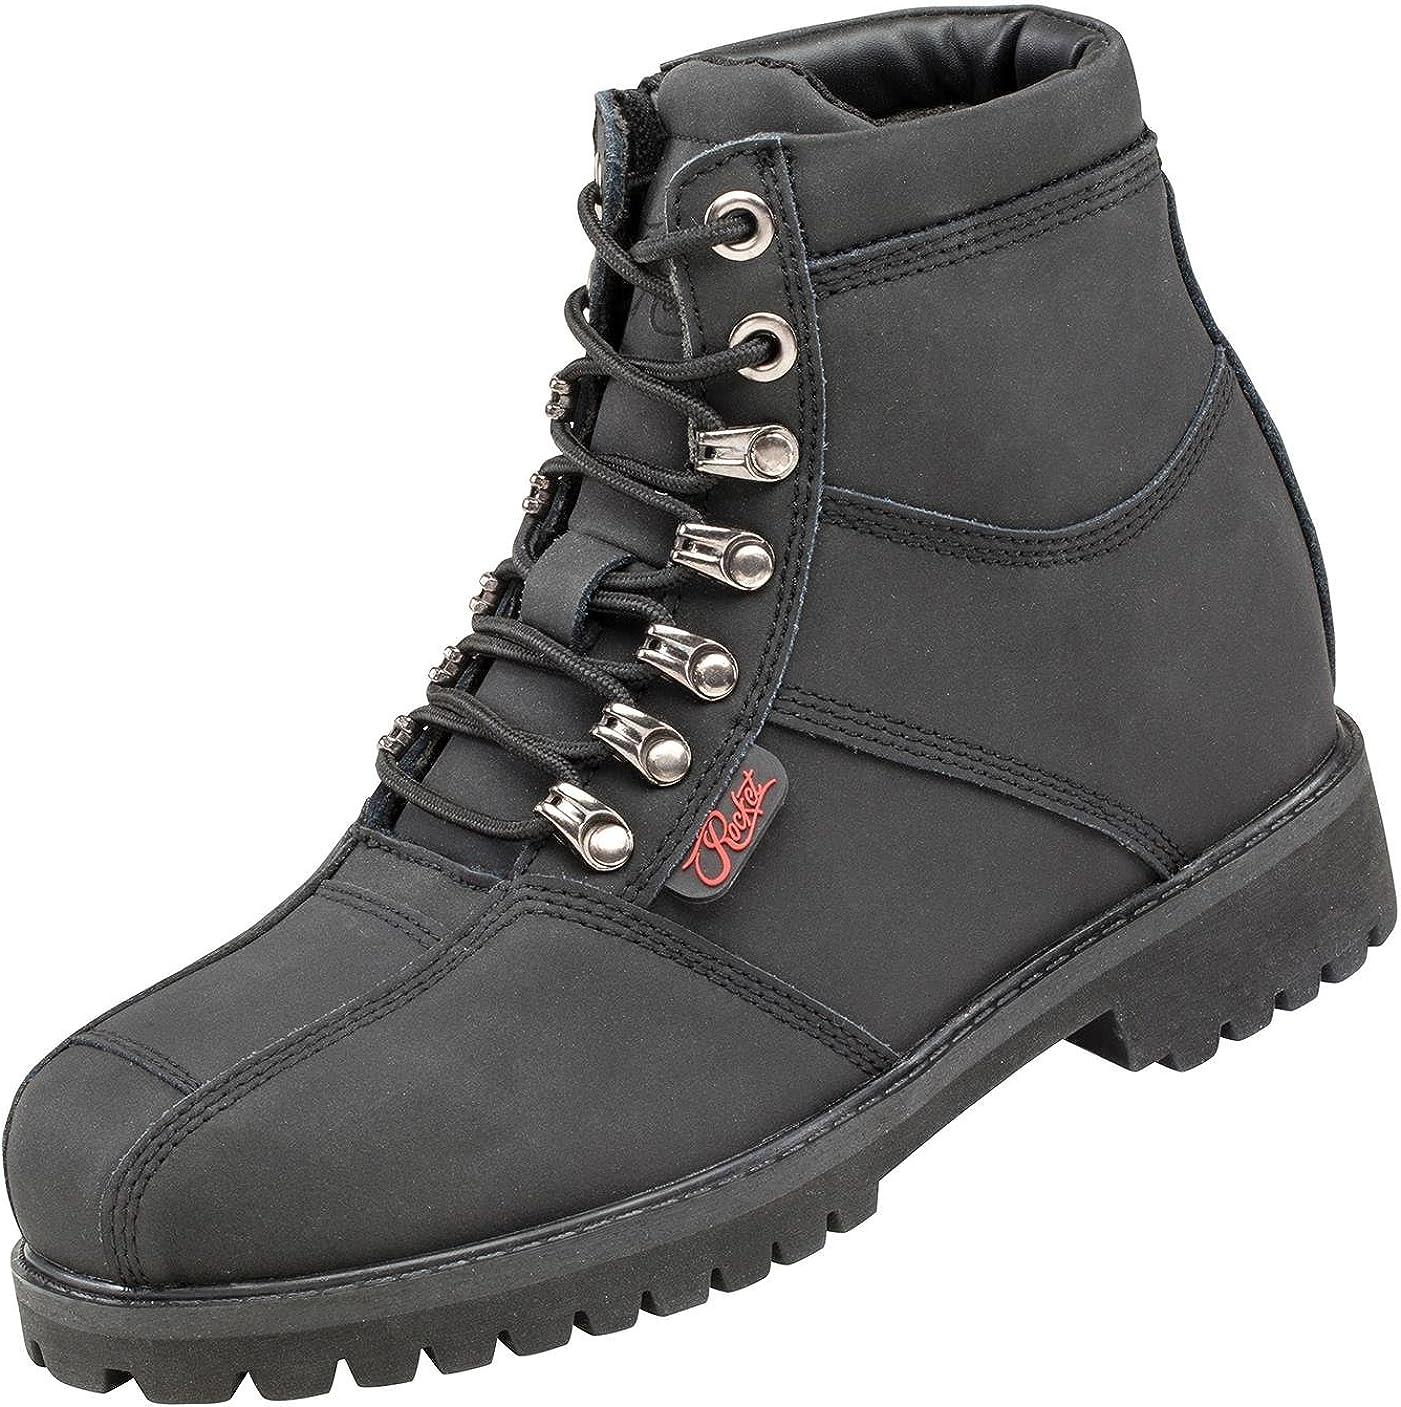 Joe Rocket Rebellion Ladie's Boots 25% OFF San Antonio Mall Riding Leather Women's